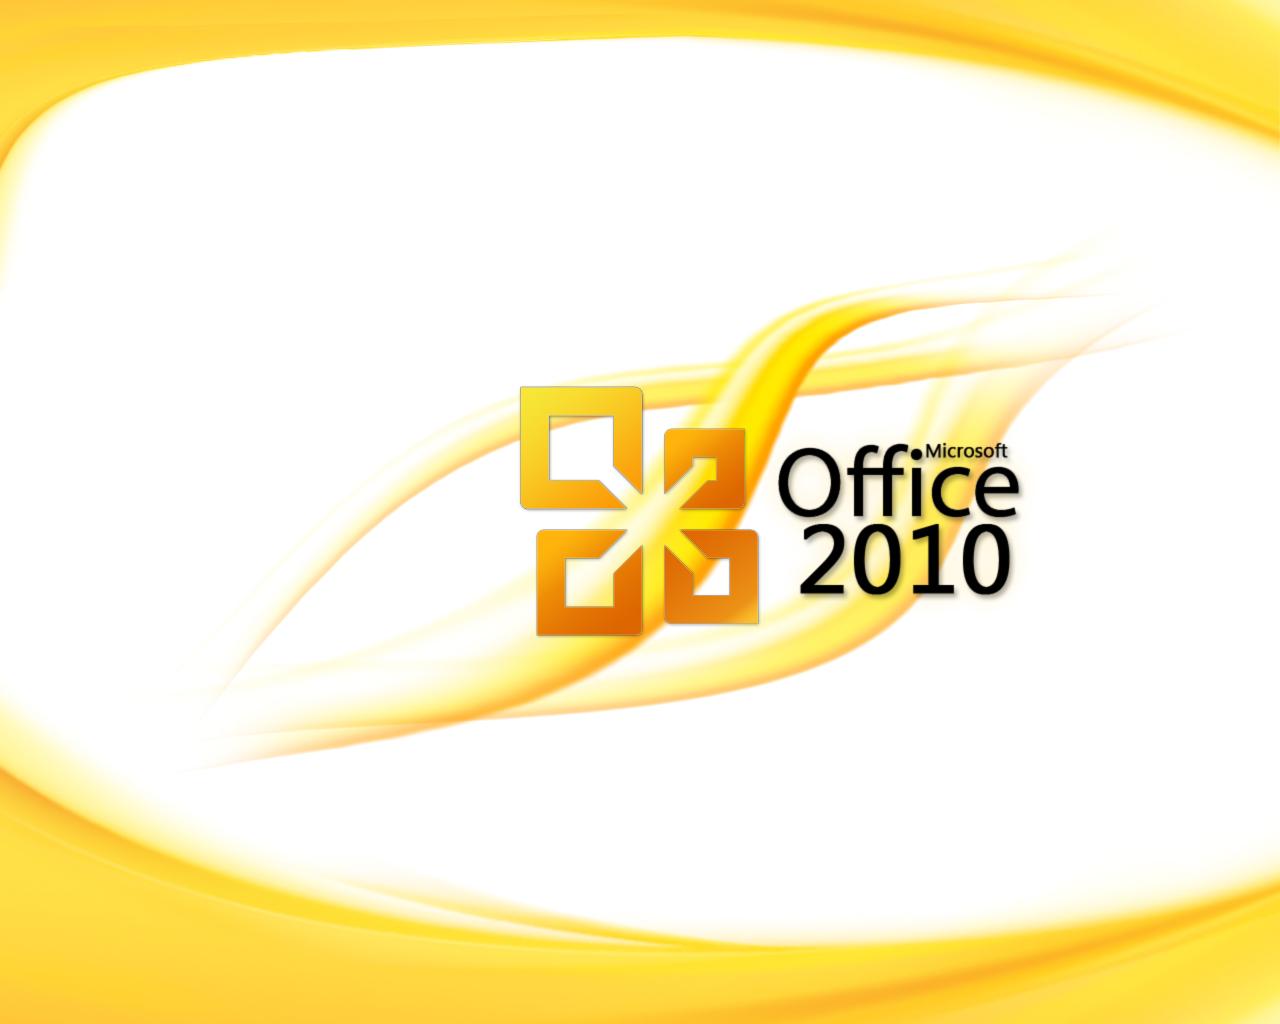 microsoft window 2010 free download